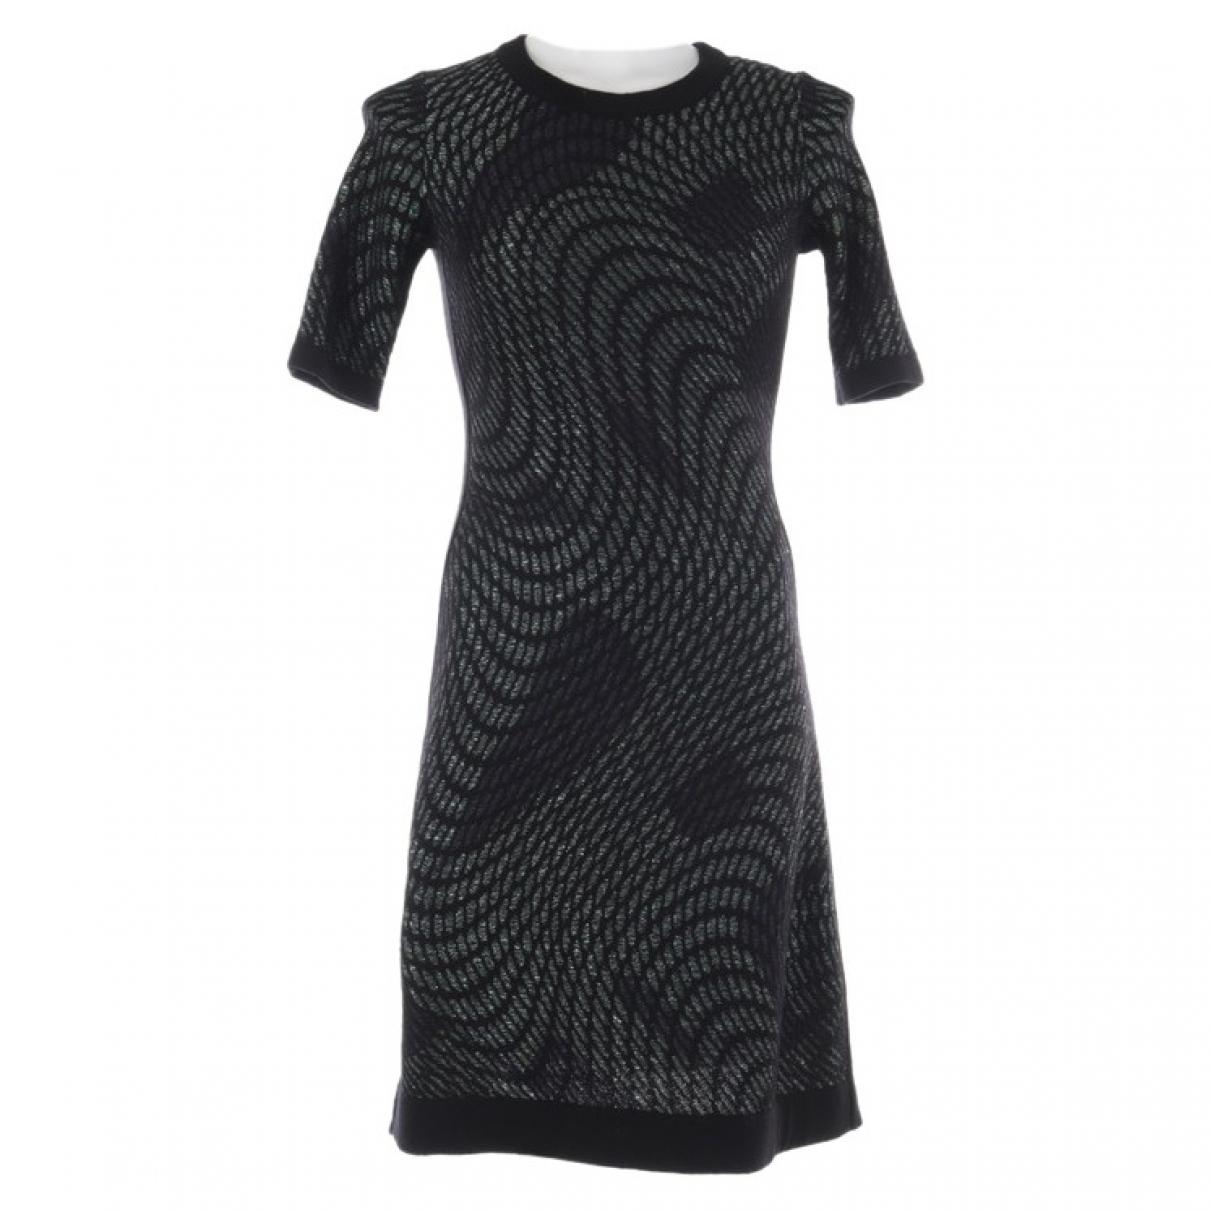 M Missoni \N Multicolour Wool dress for Women 34 FR